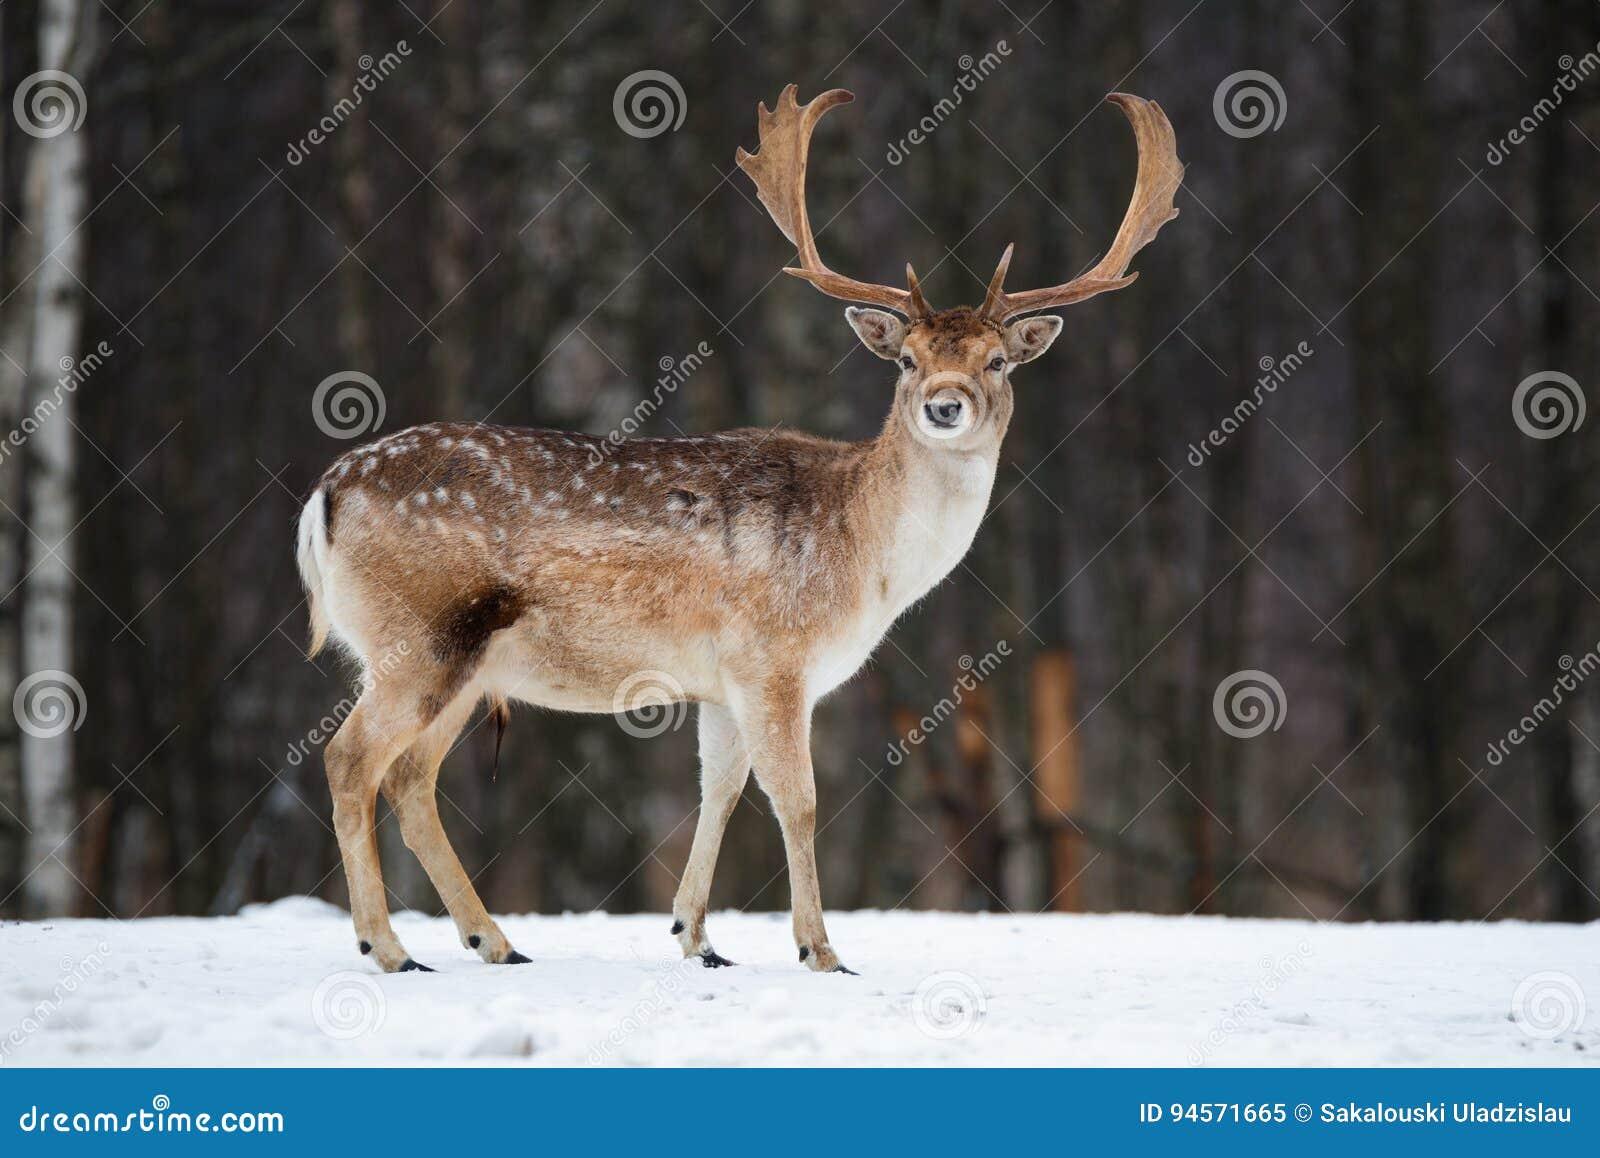 Fallow Deer Buck. Majestic powerful adult Fallow Deer, Dama dama, in winter forest, Belarus. Wildlife scene from nature, Europe.A